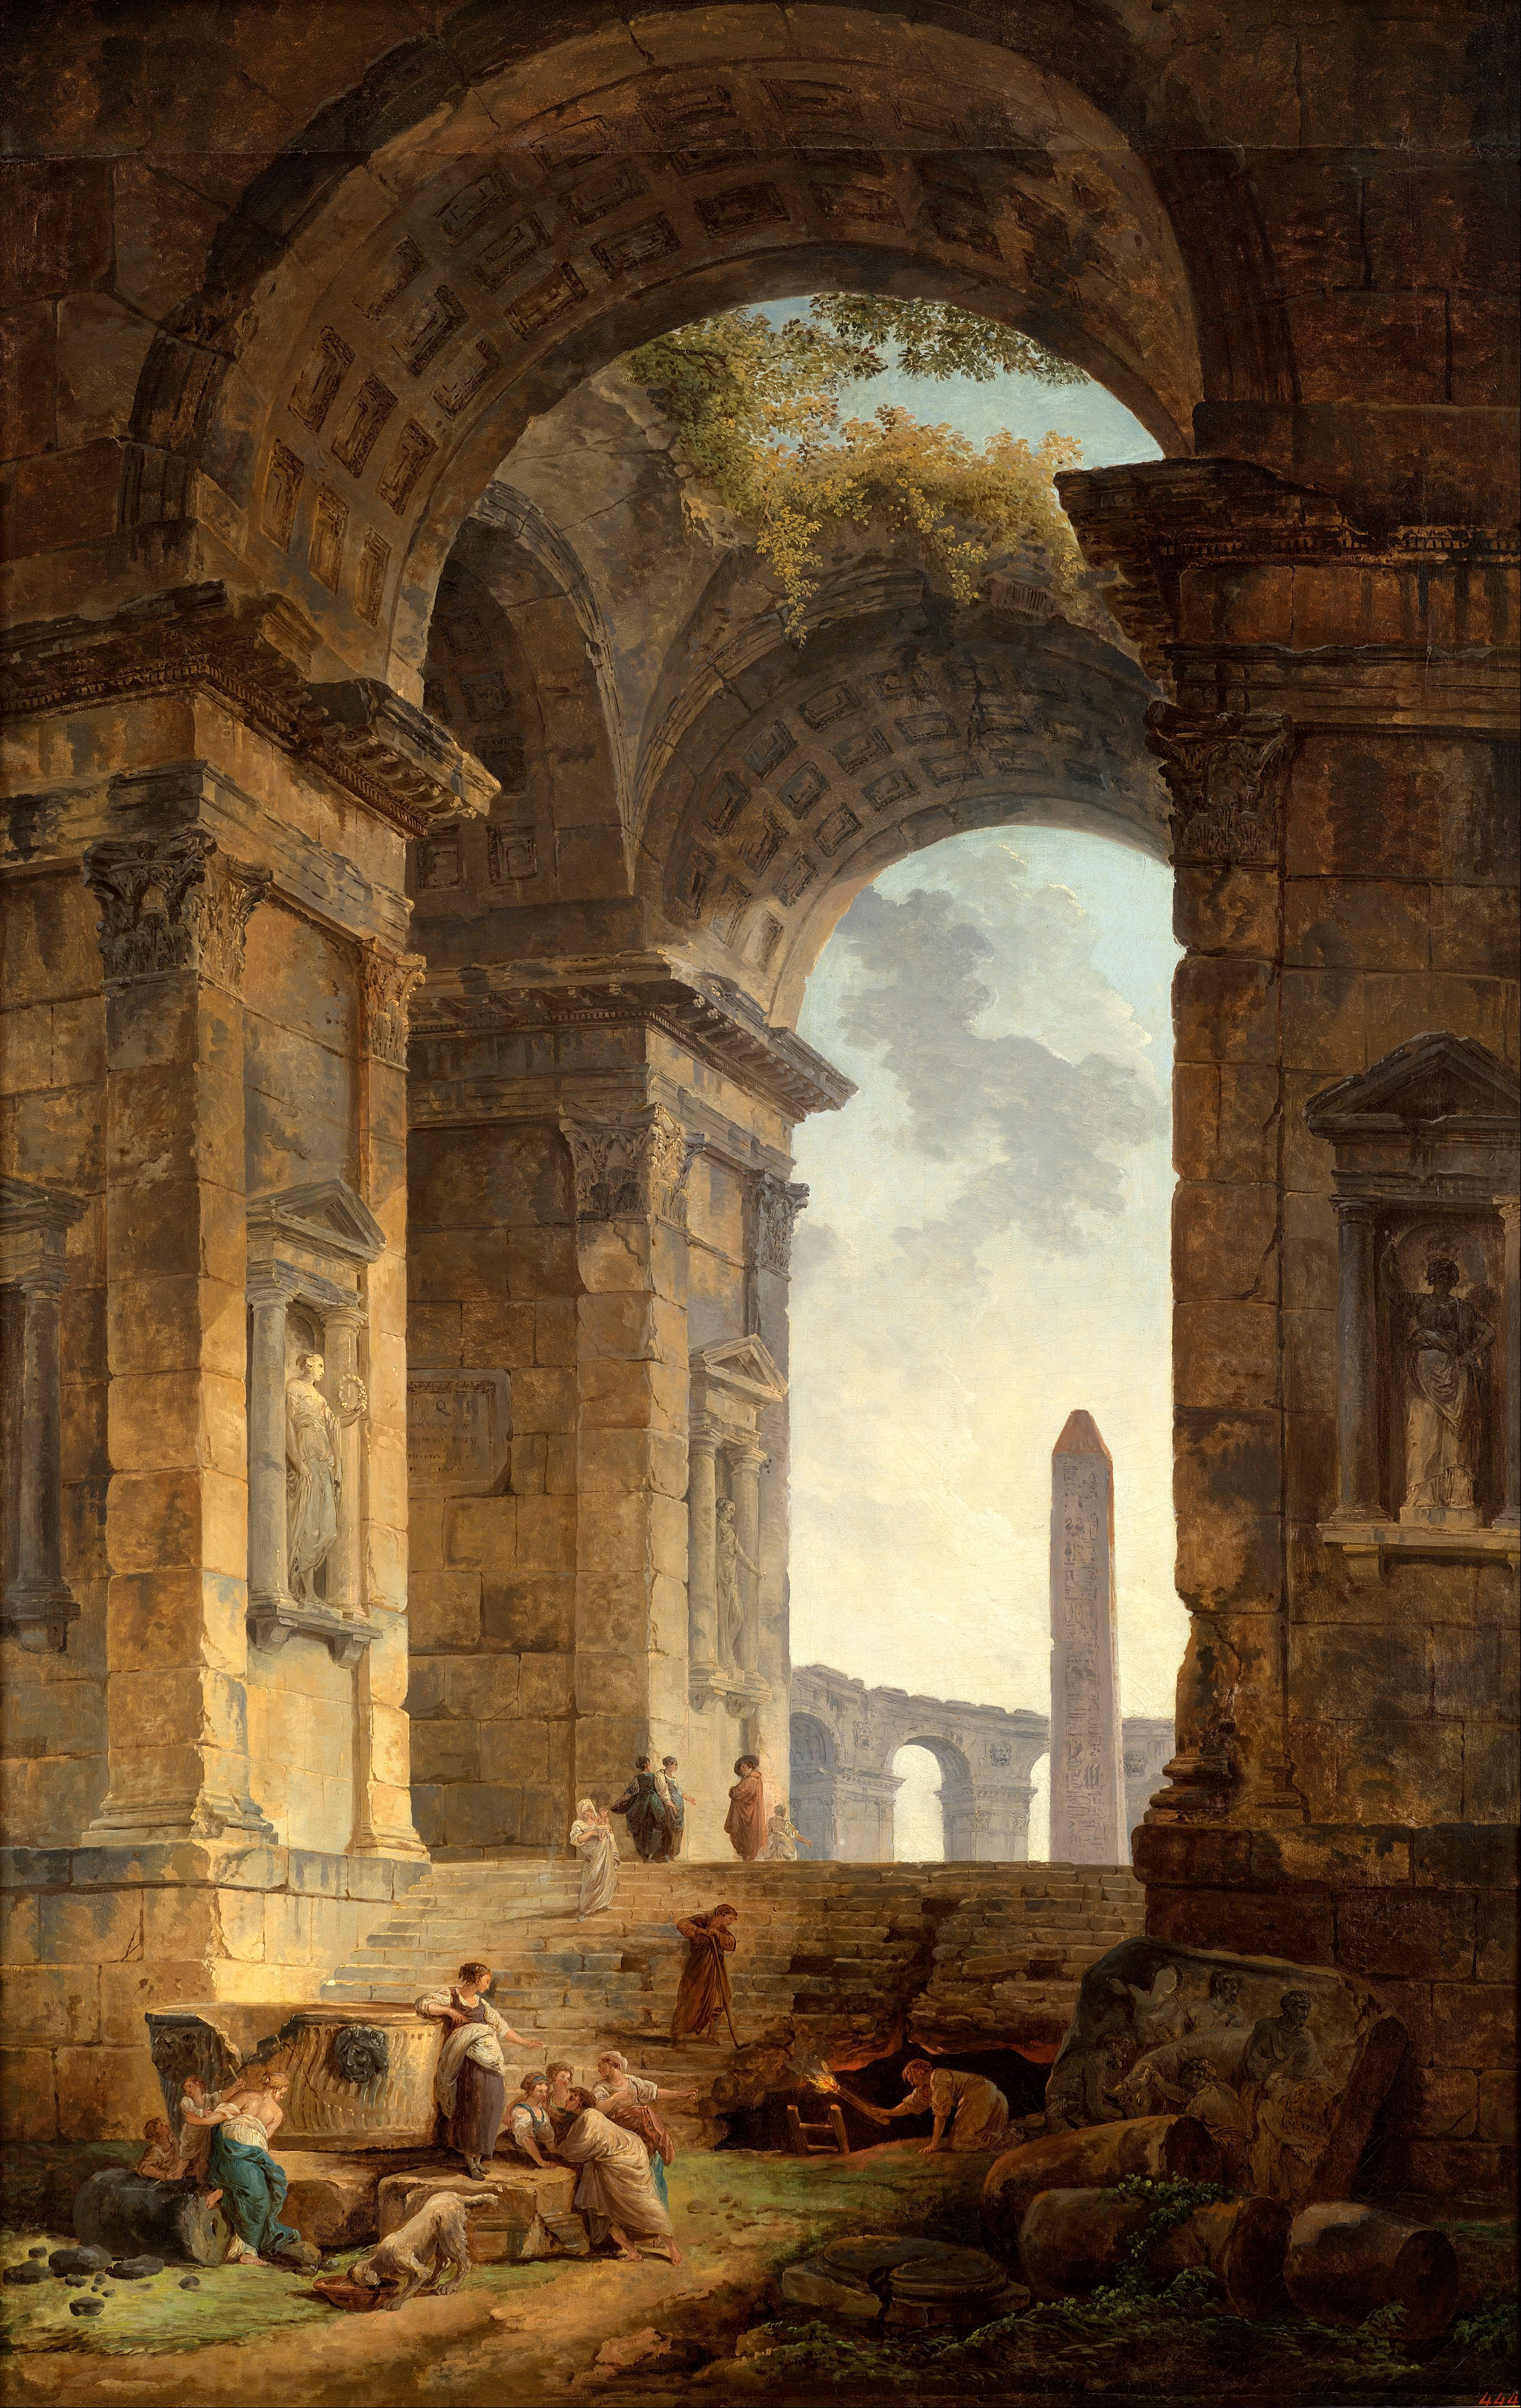 Hubert-Robert-1775-_Ruins_with_an_obelisk_in_the_distance